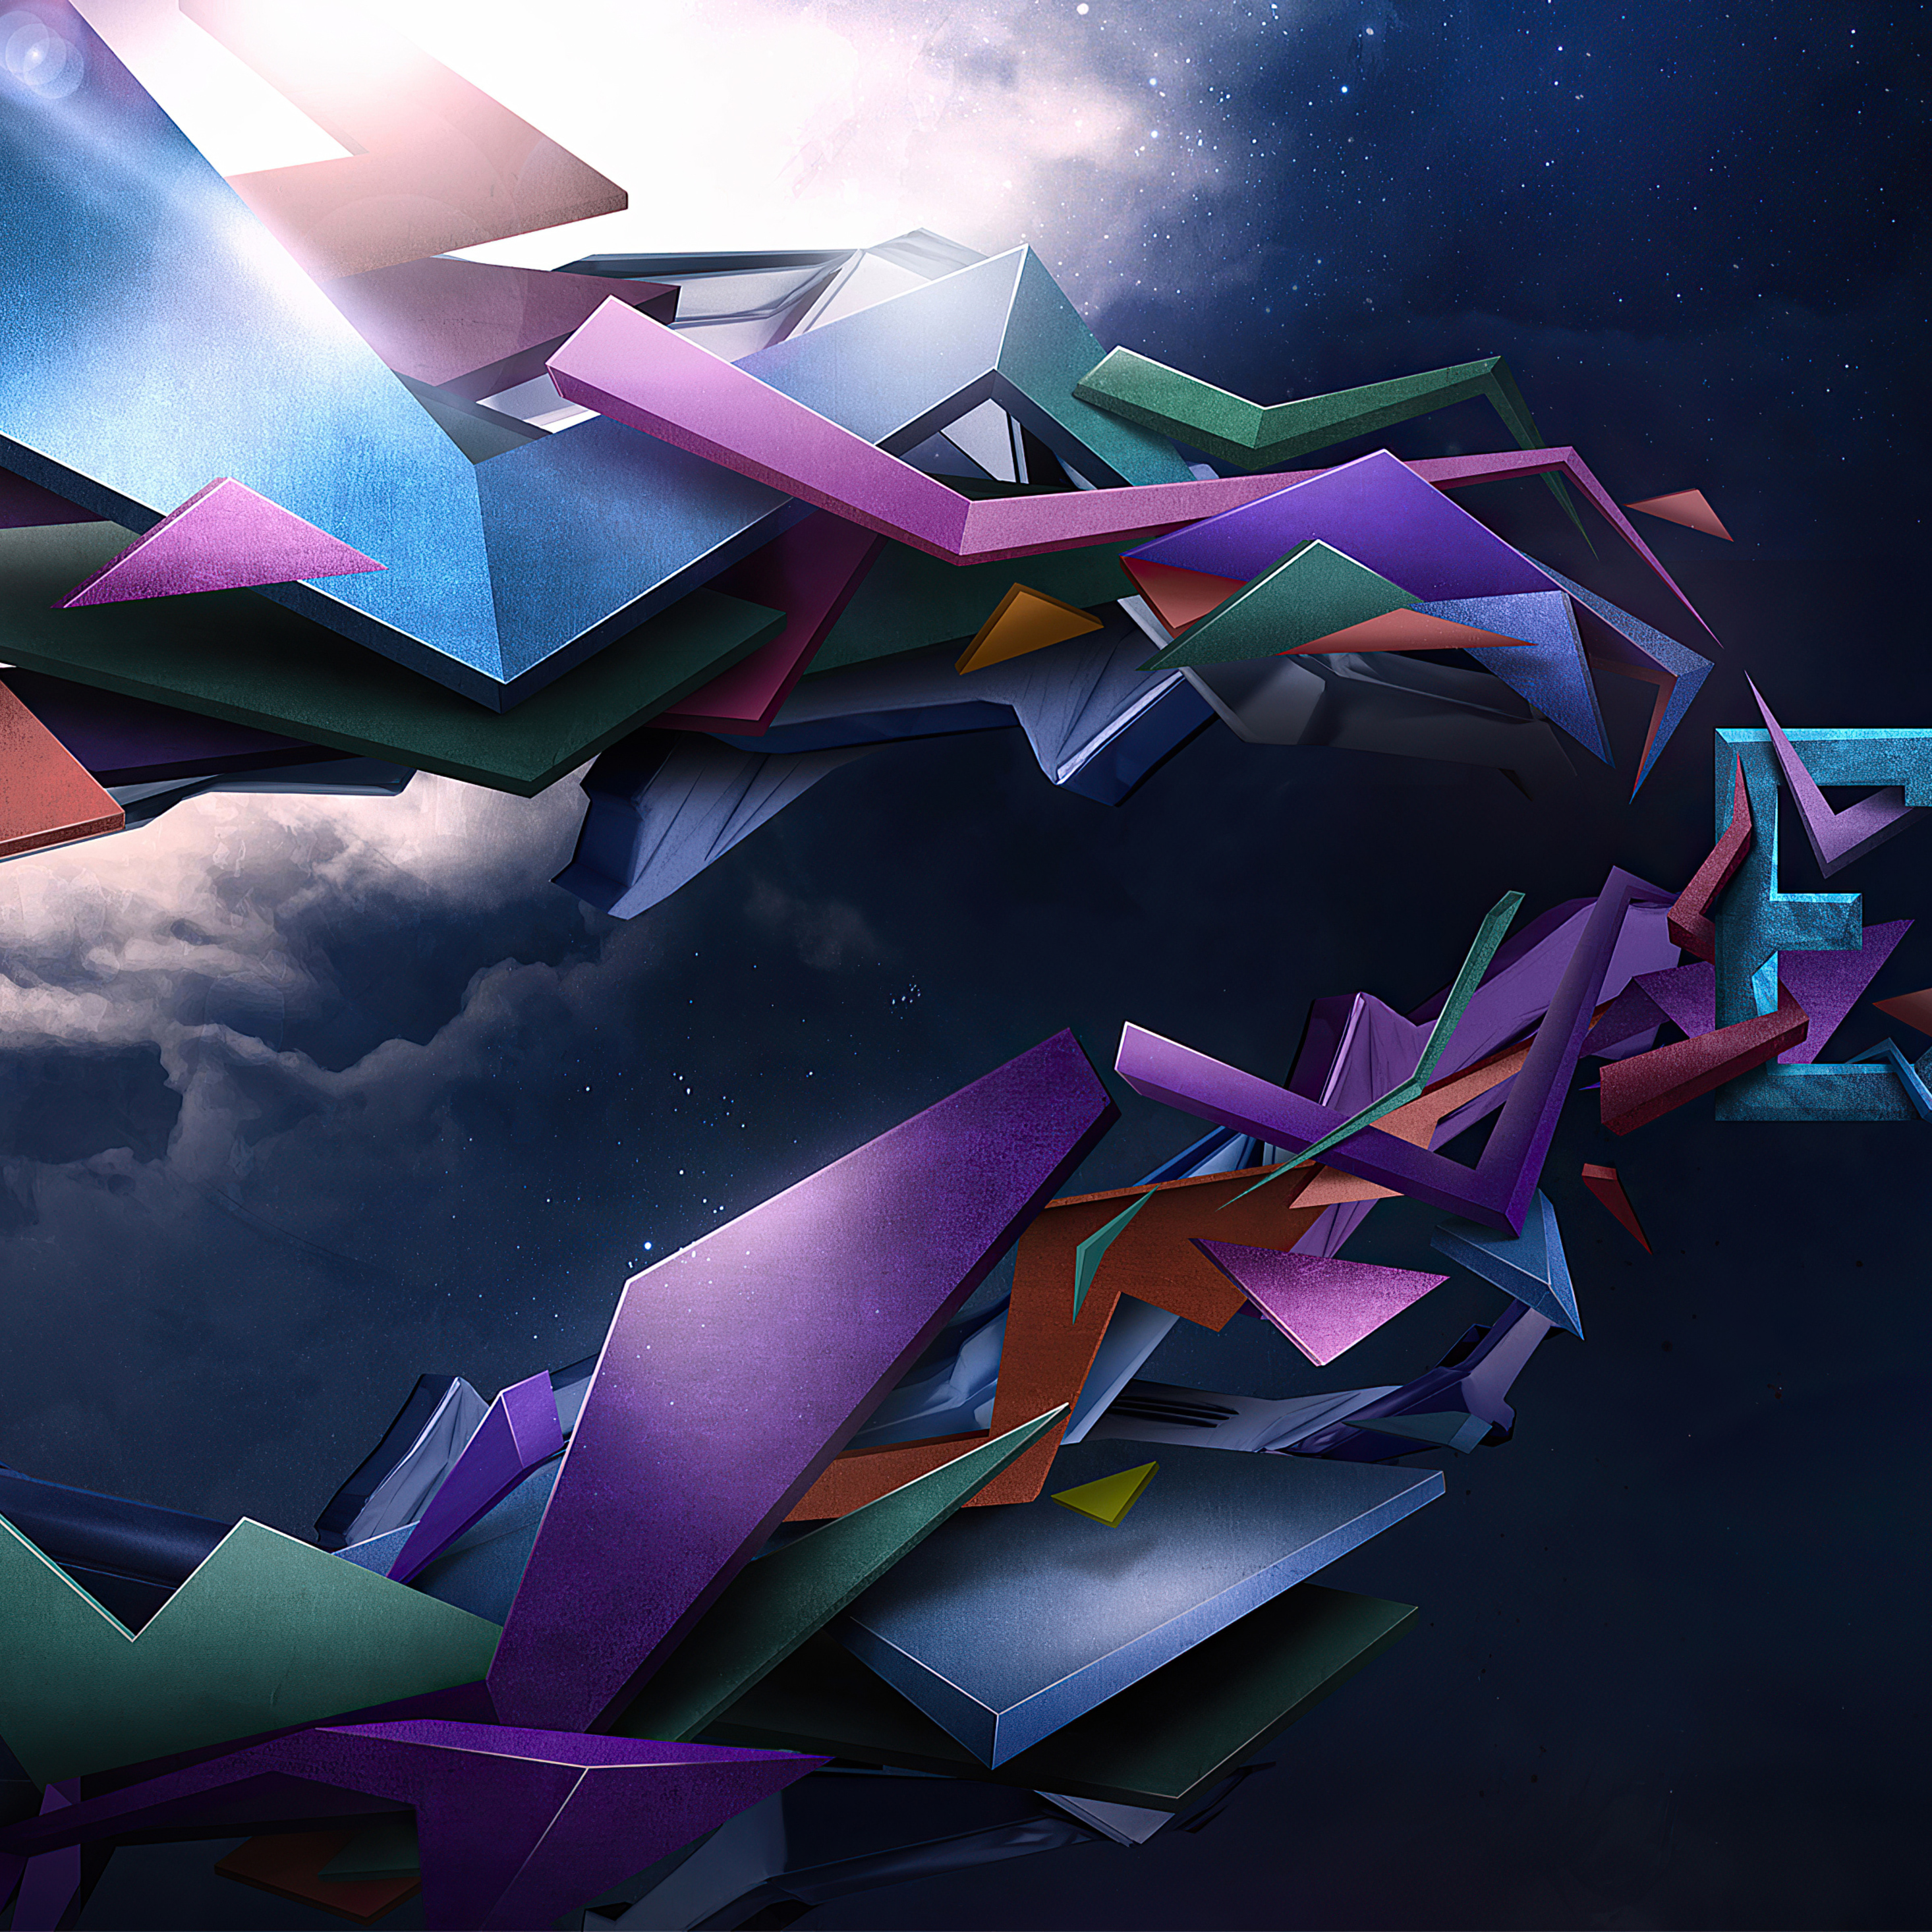 artistic-3d-shapes-4k-abstract-q7.jpg